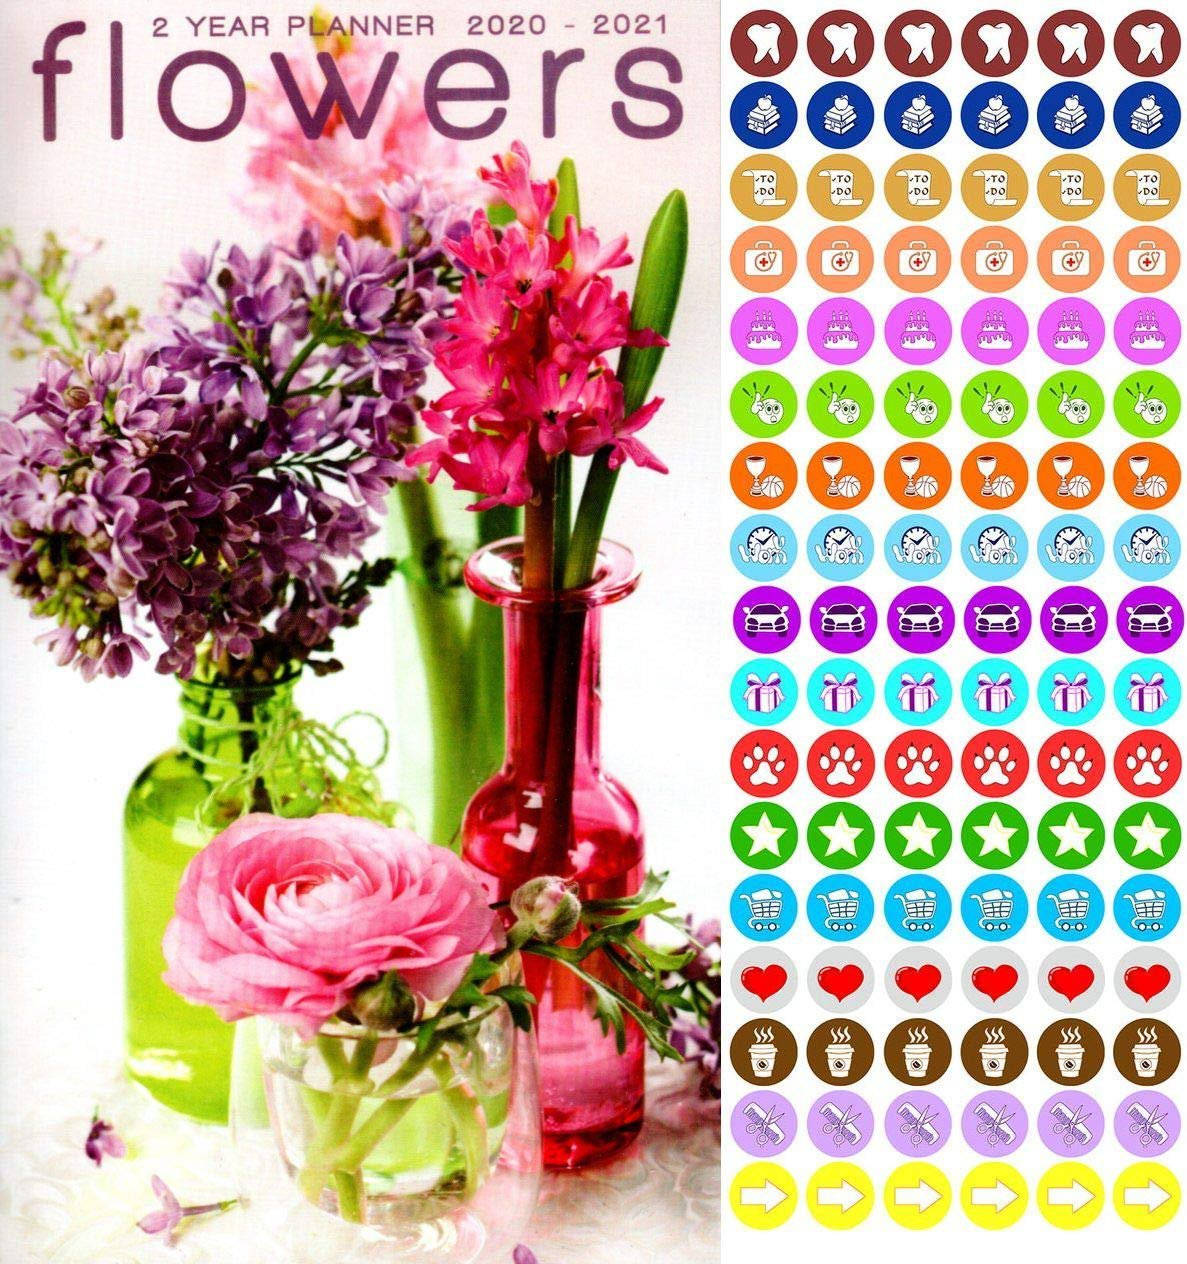 Flowers - 2020-2021 2 Year Pocket Planner/Calendar/Organizer